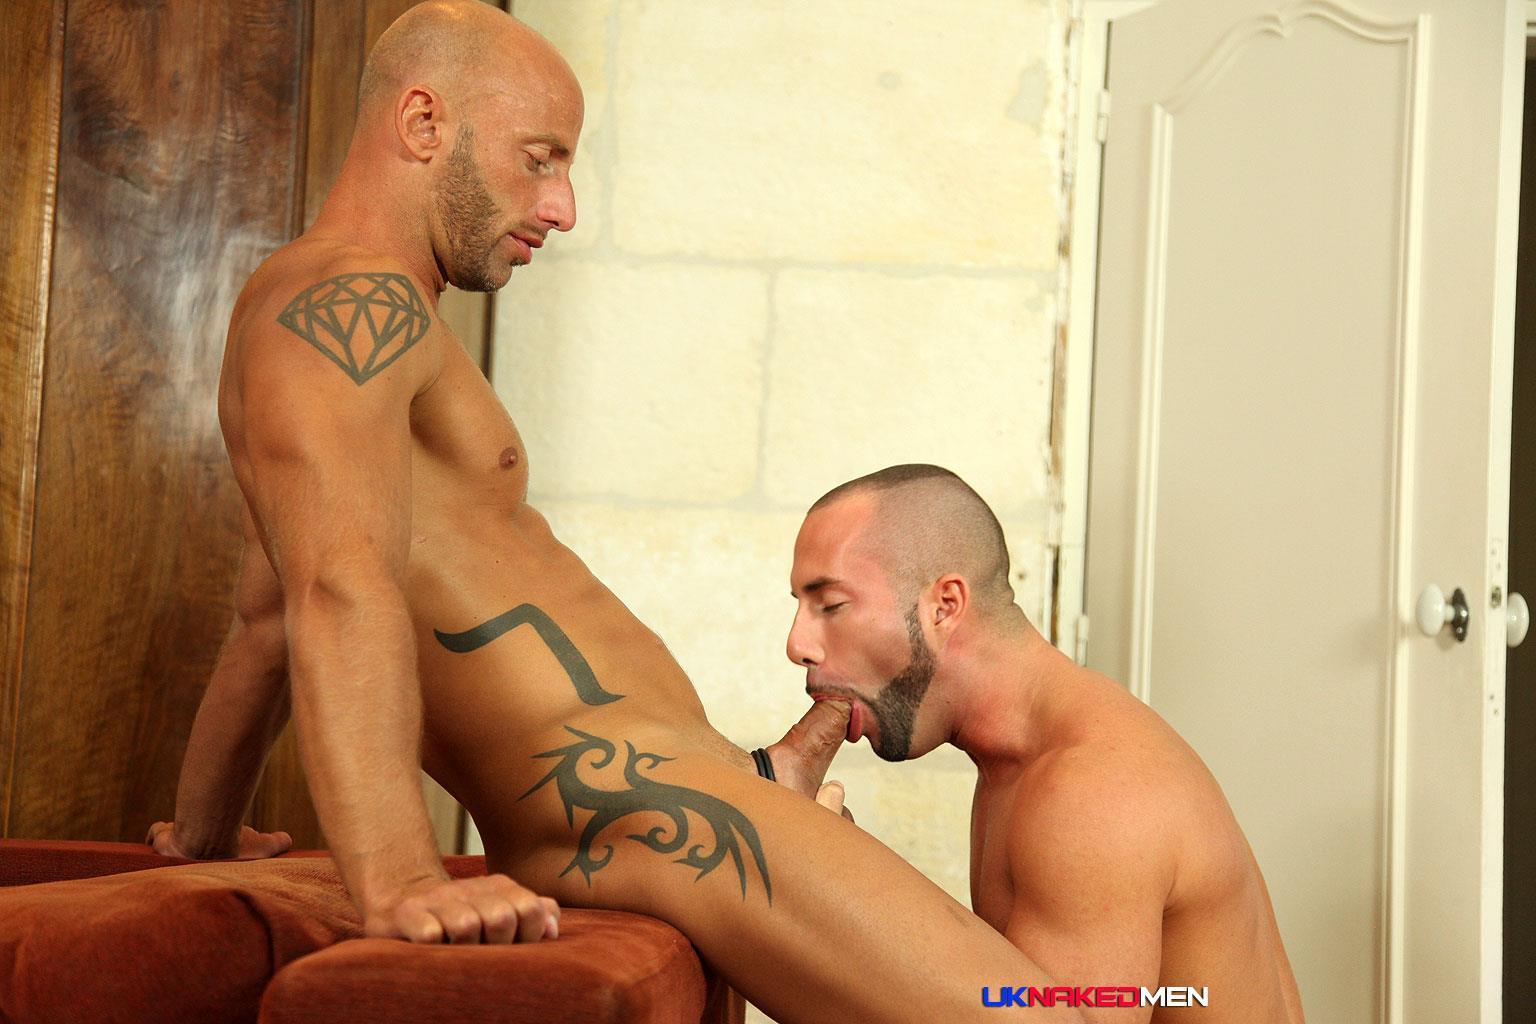 UK-Naked-Men-Aymeric-Deville-and-Craig-Farrel-Big-Thick-Uncut-Cocks-Fucking-Amateur-Gay-Porn-12 Aymeric Deville And His Thick Uncut Cock Getting Fucked By A Stranger